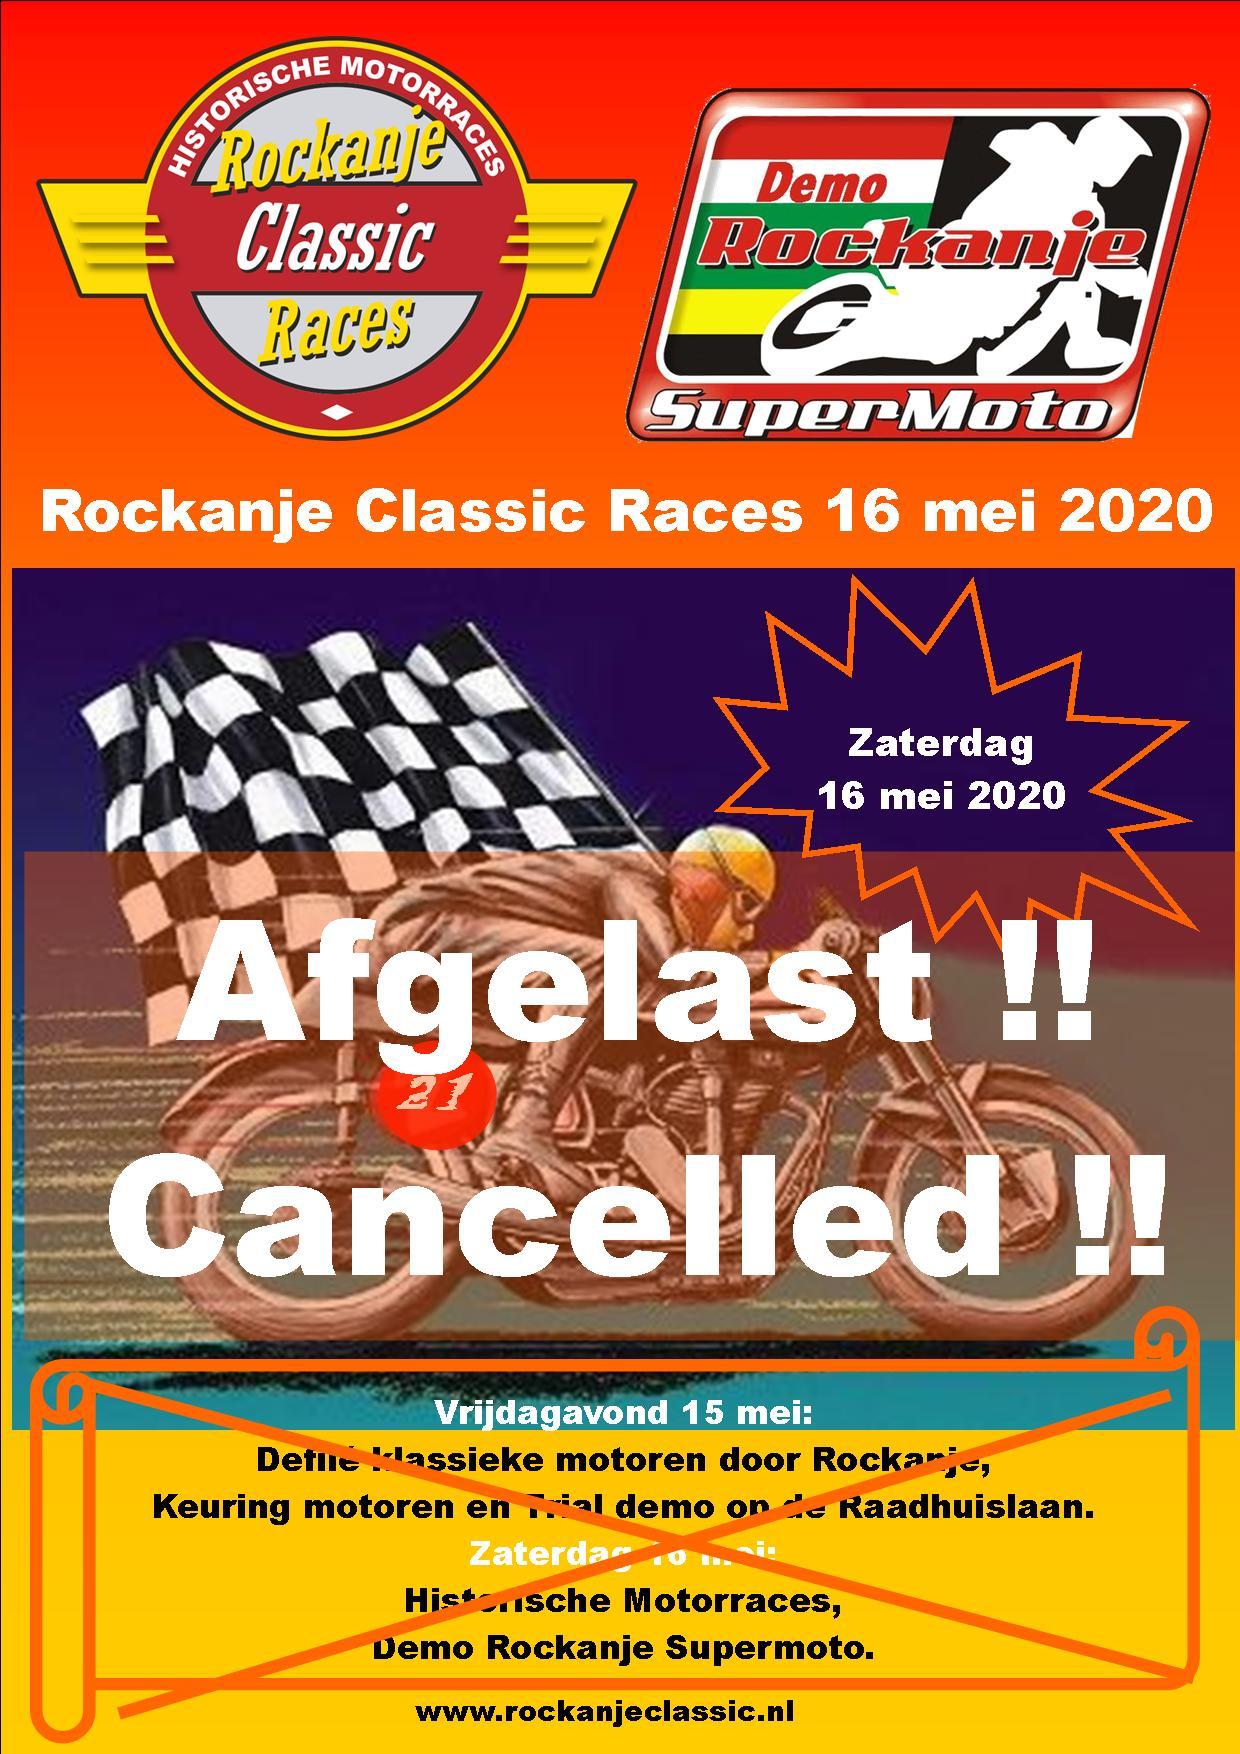 Rockanje Classic Races 2020 afgelast.